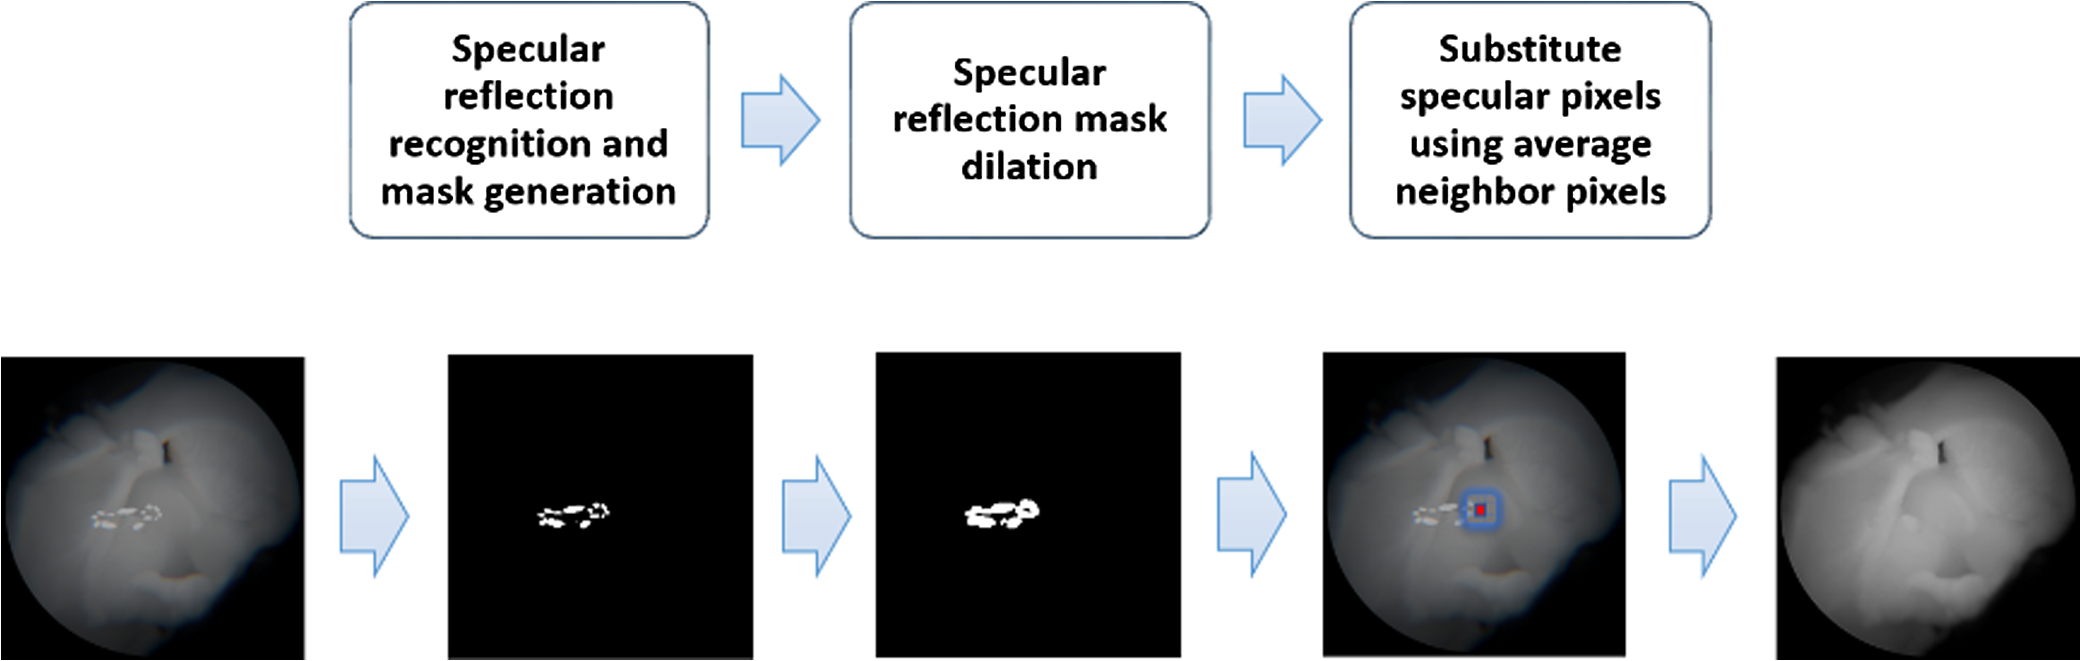 Calibration of fluorescence imaging for tumor surgical margin